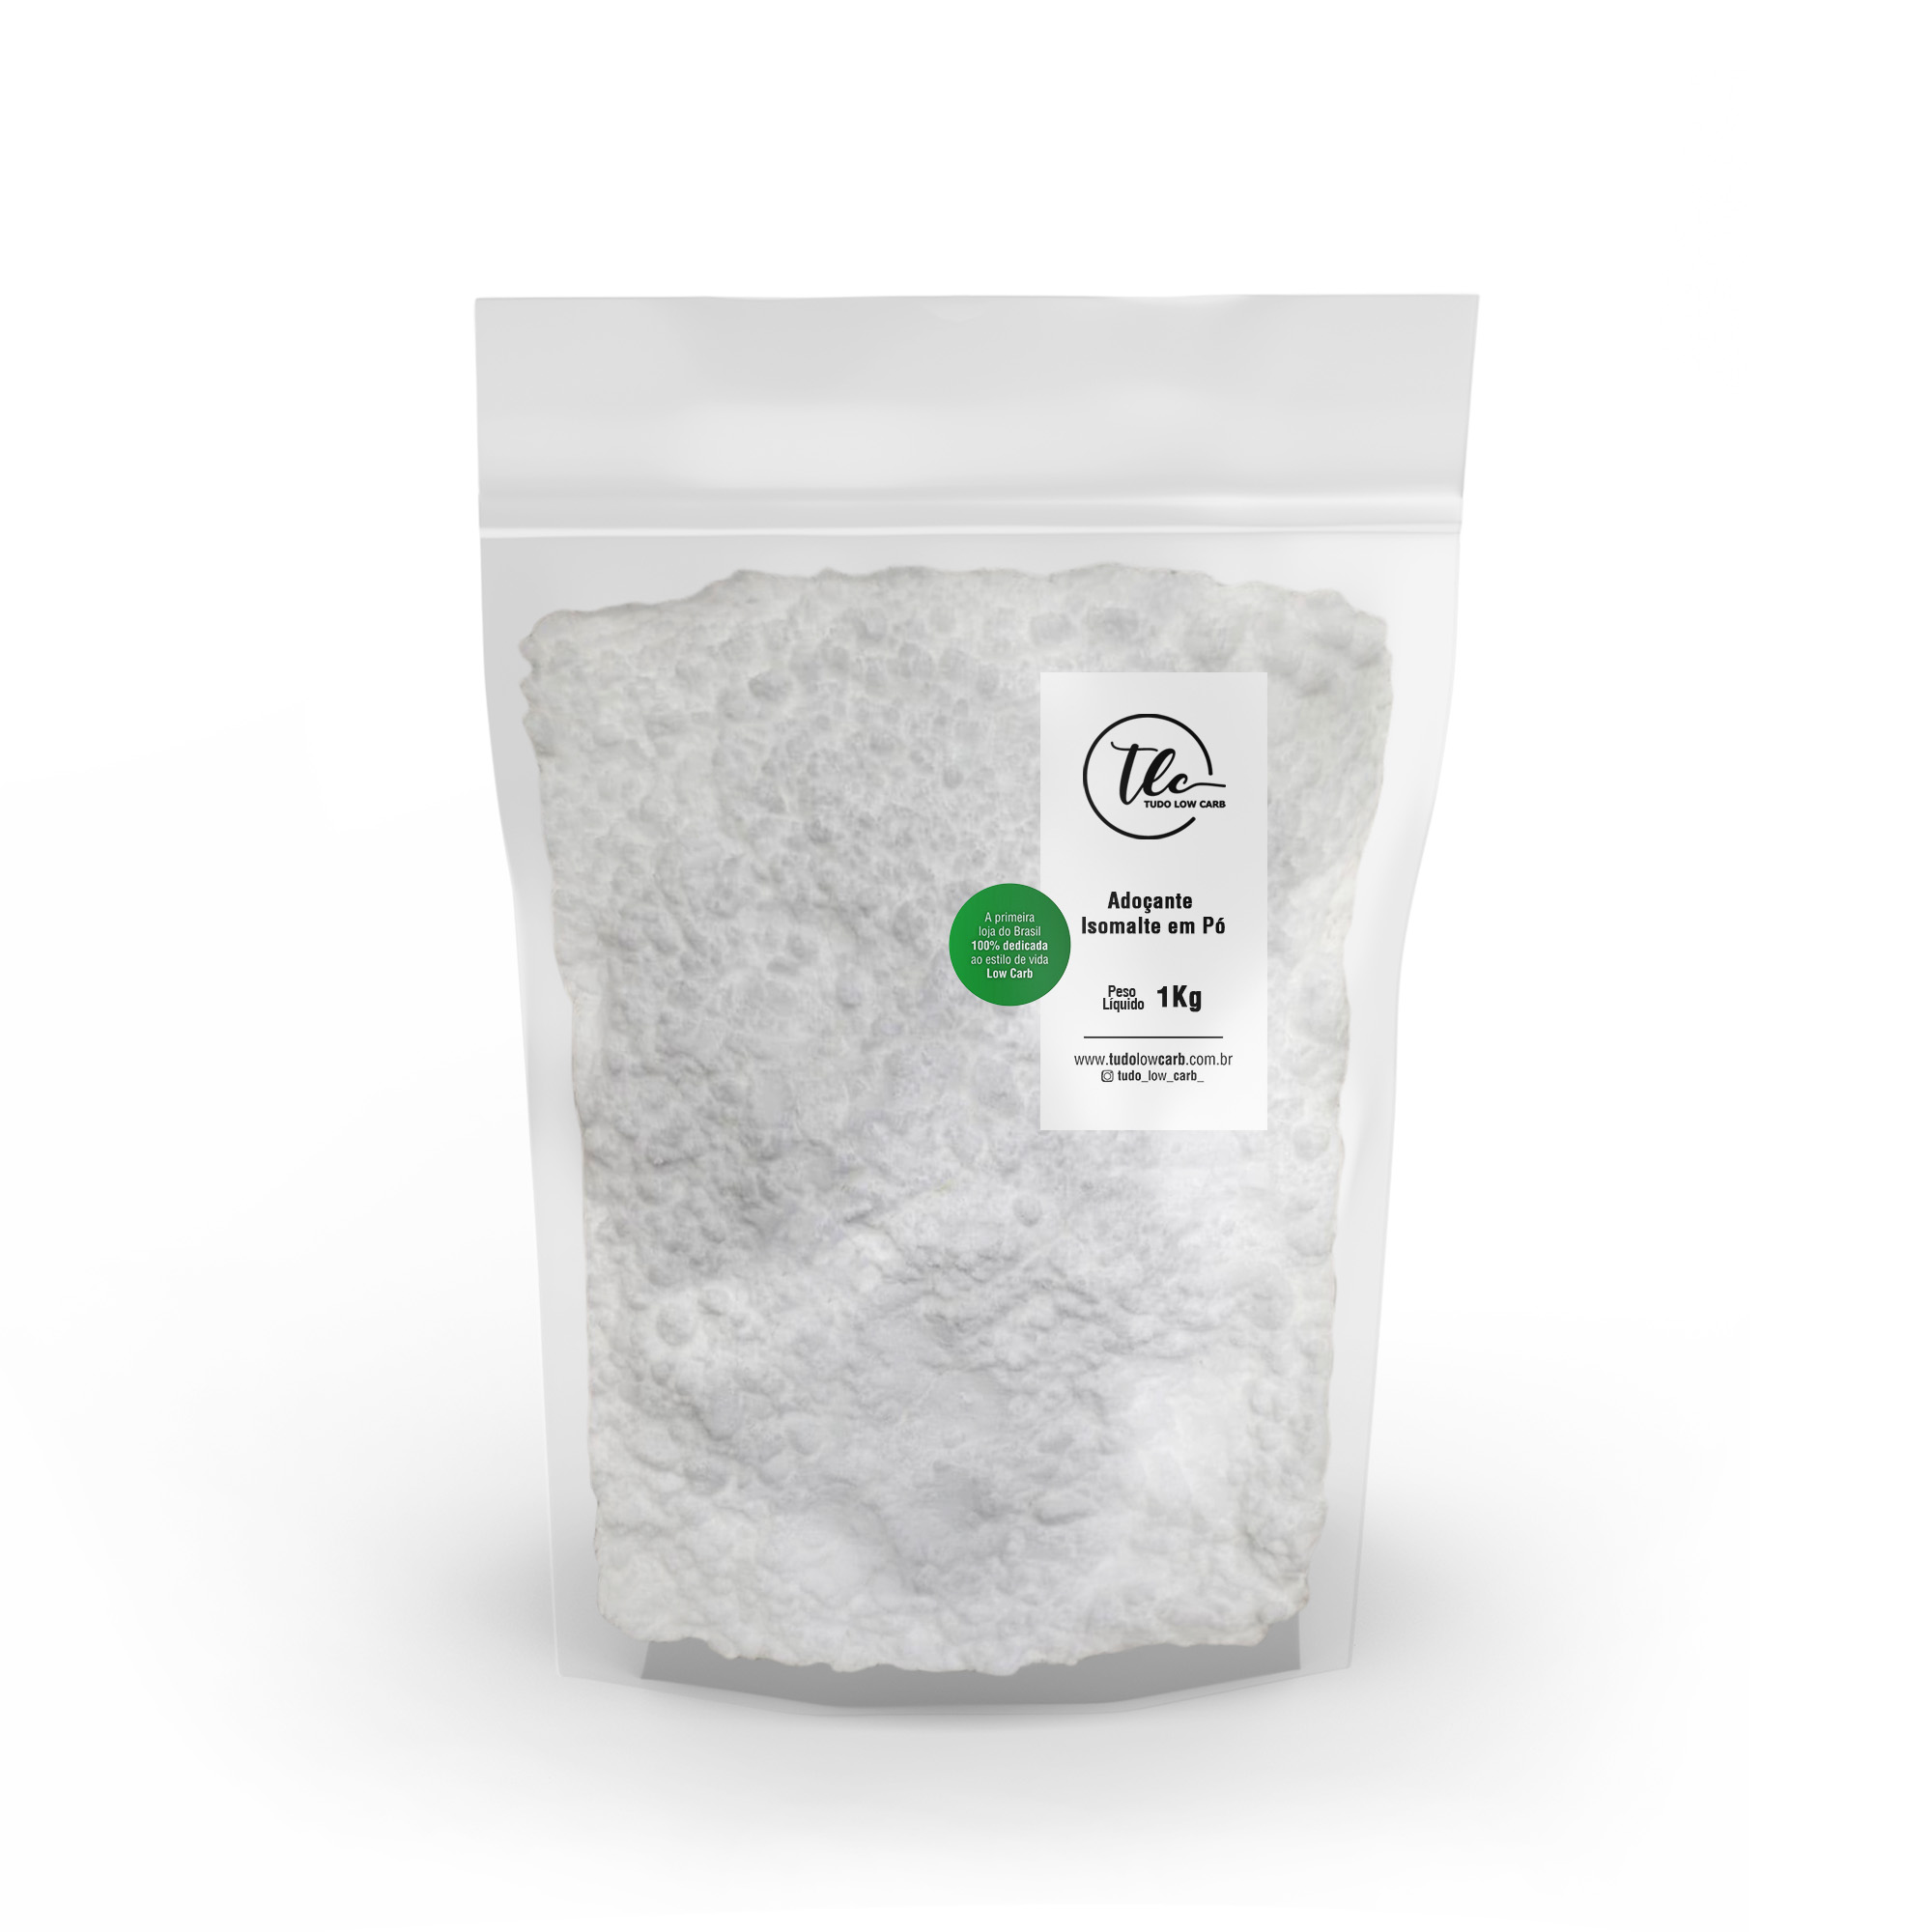 Adoçante Isomalte em Pó 1 kg  - TLC Tudo Low Carb